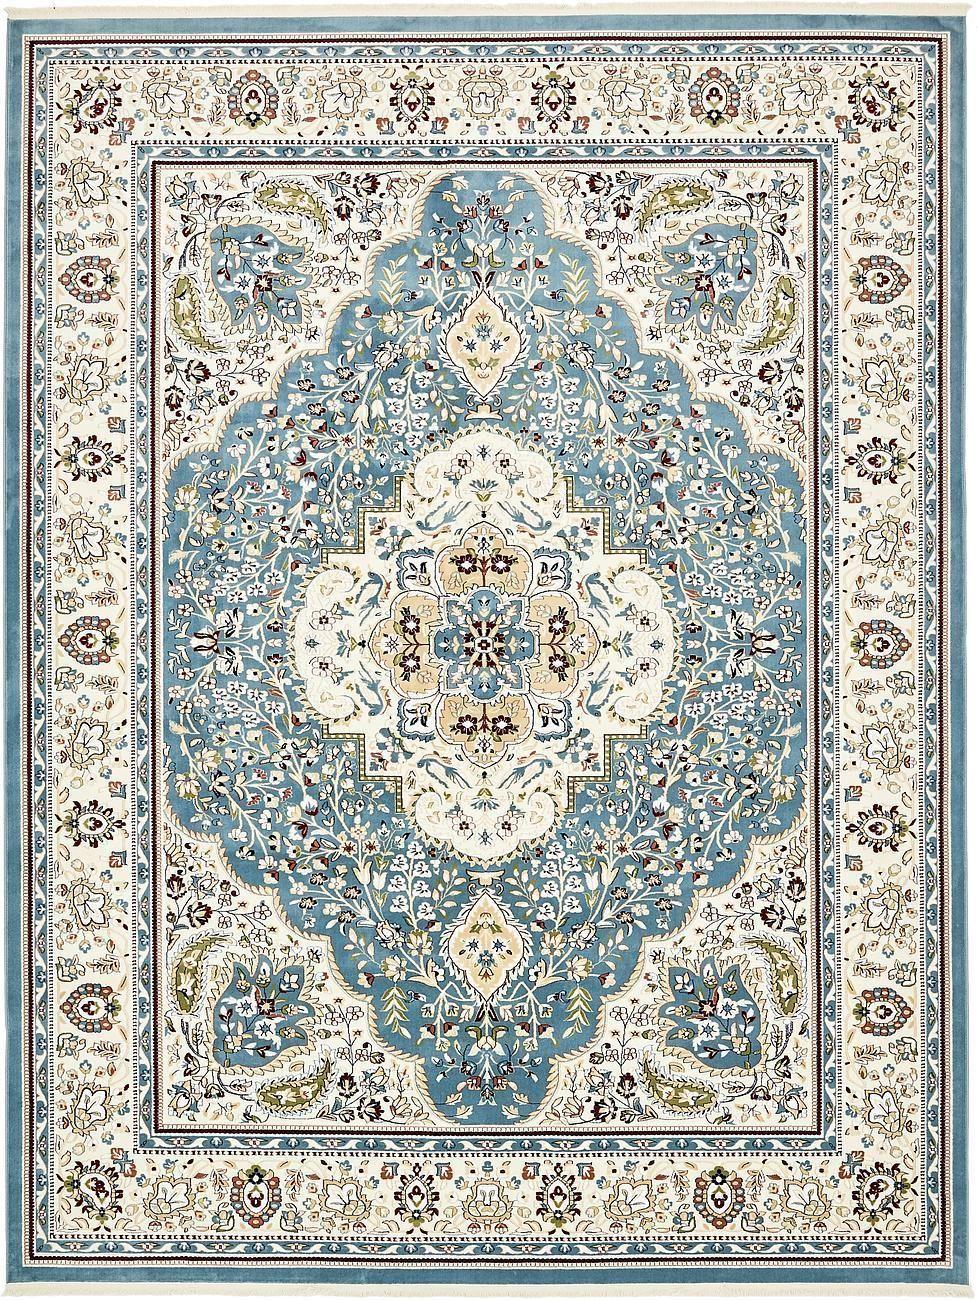 Blue 13 X 19 8 Tabriz Design Rug Area Rugs Esalerugs Rug